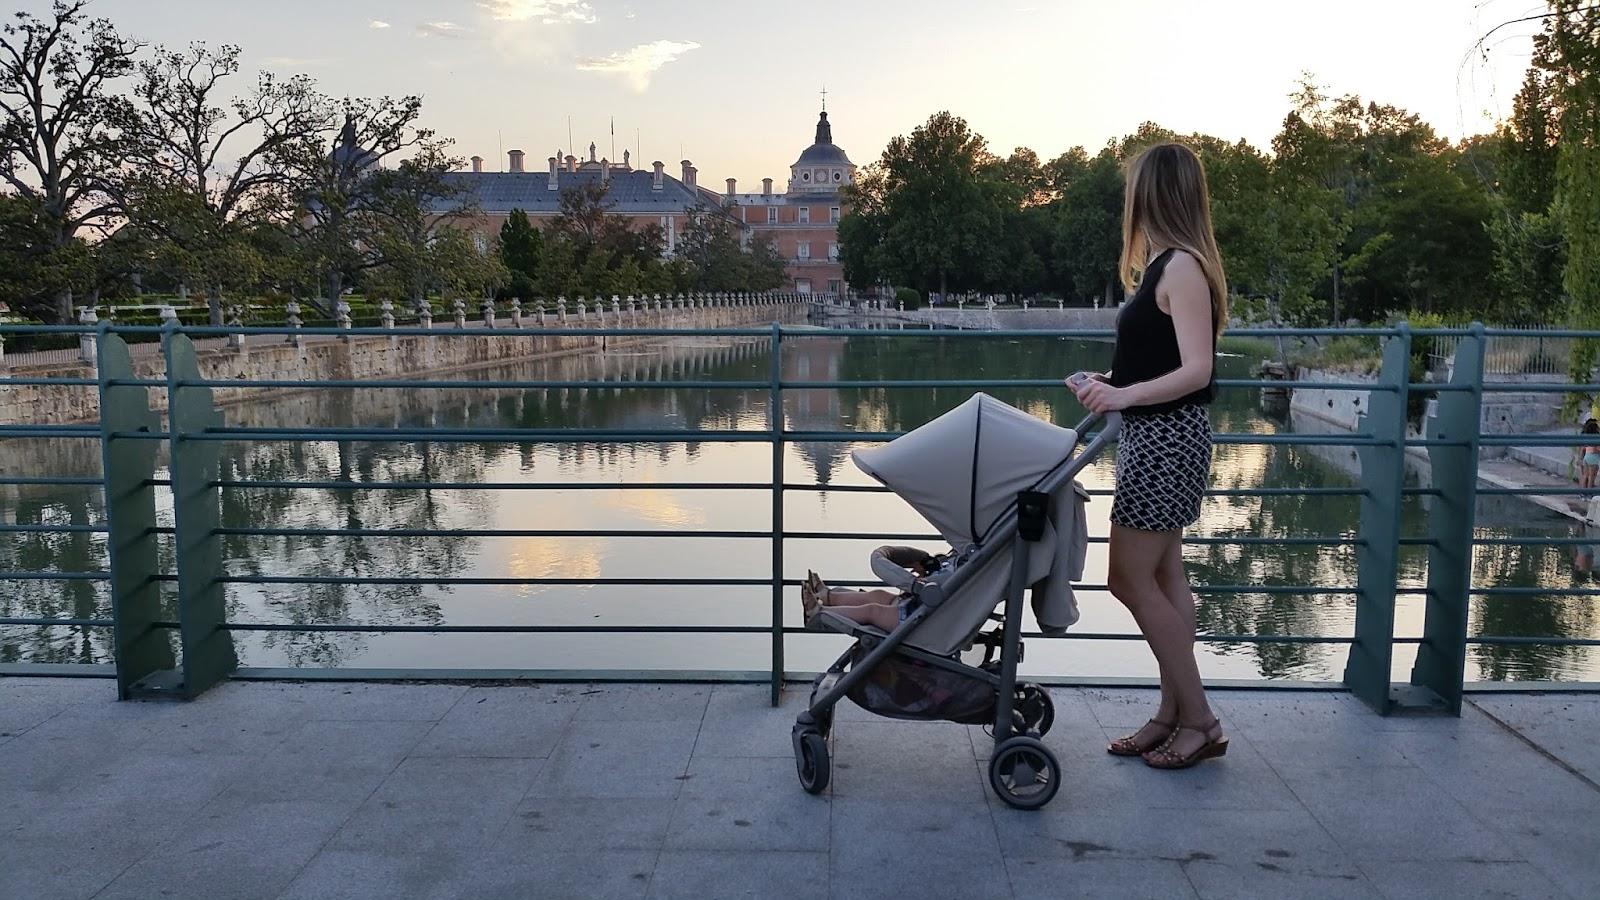 Mami a la moda spot de b b car una gran silla de paseo - Silla de paseo bebecar spot precio ...